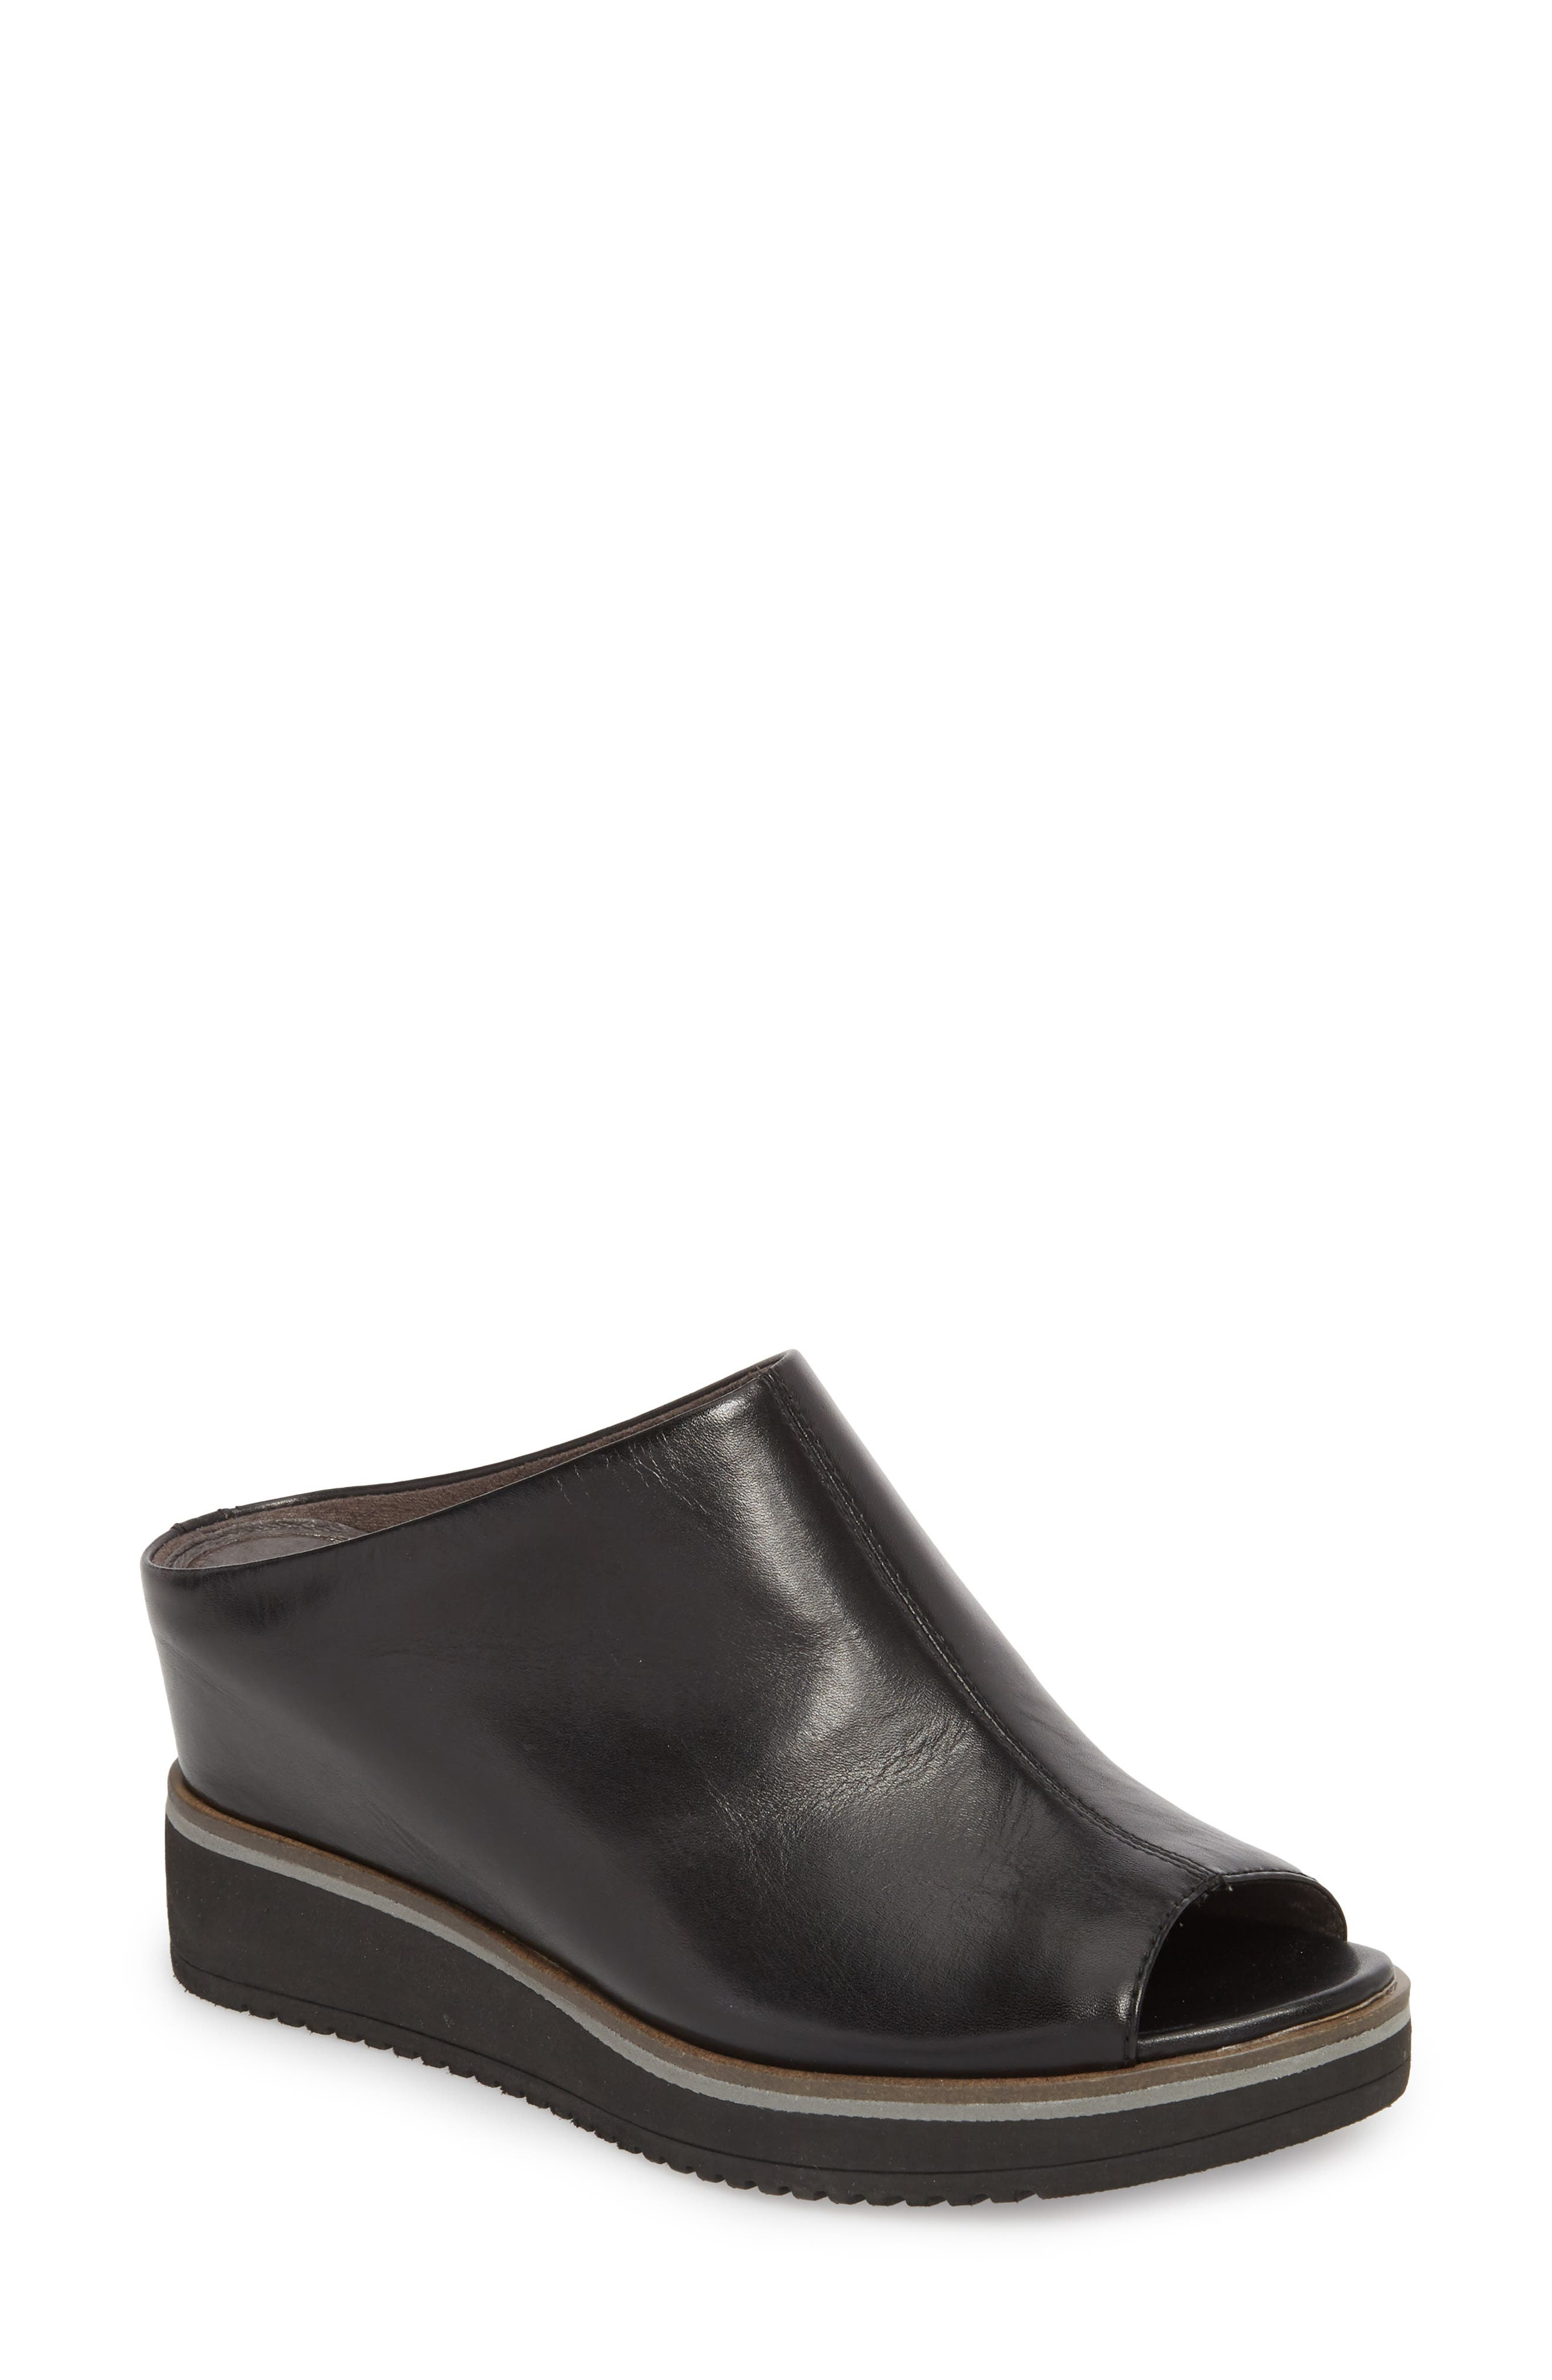 Alis Wedge Sandal,                         Main,                         color, Black/ Black Leather